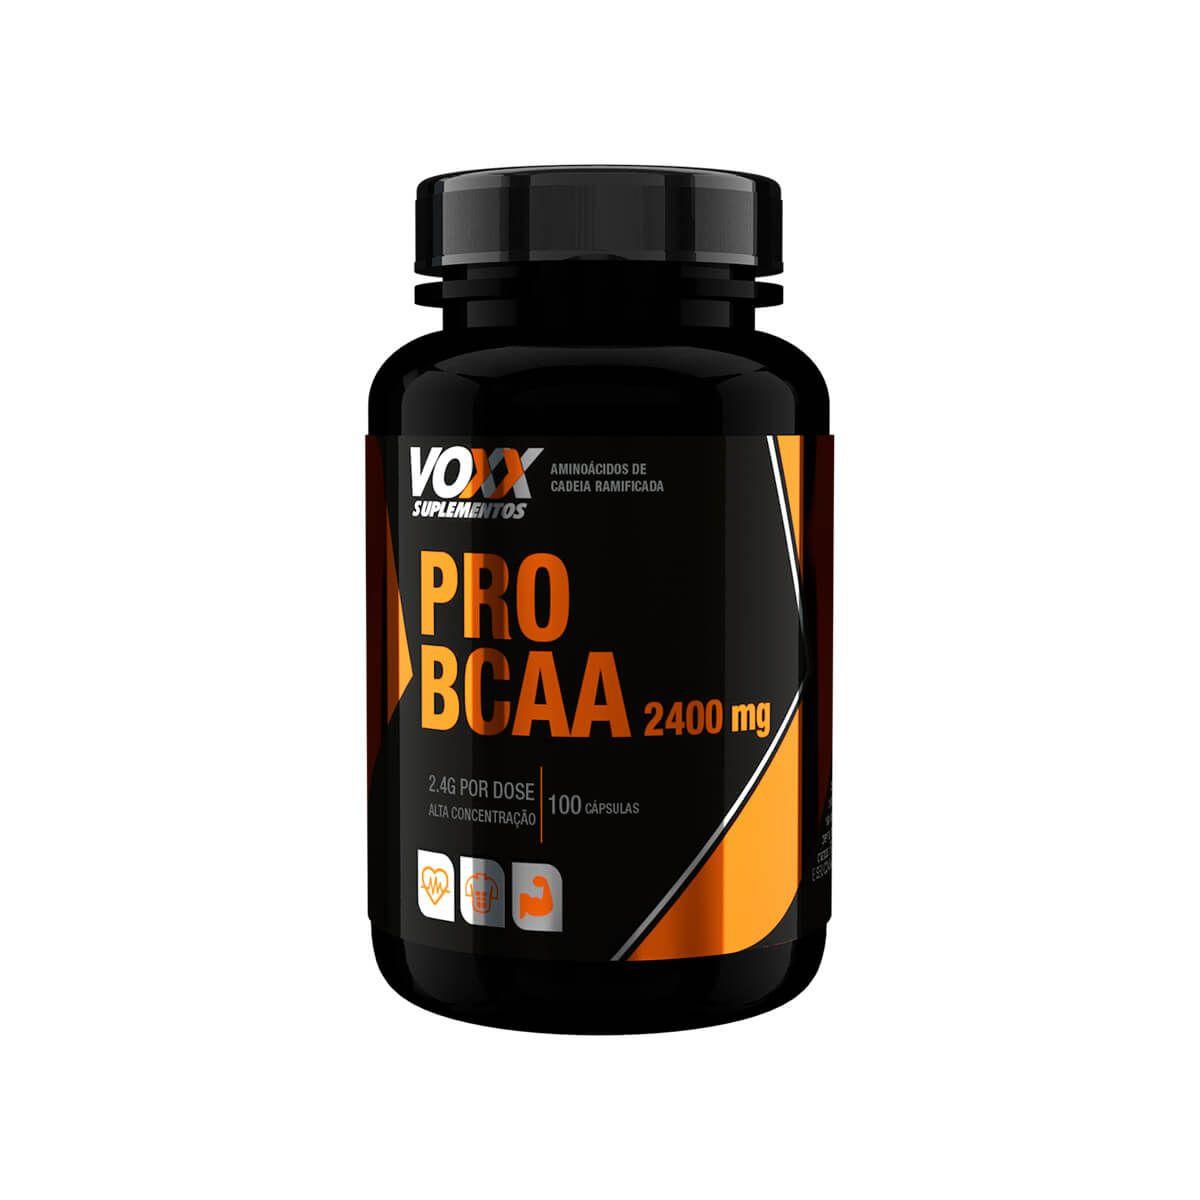 PRO BCAA 2400mg Voxx Suplementos - 100 caps